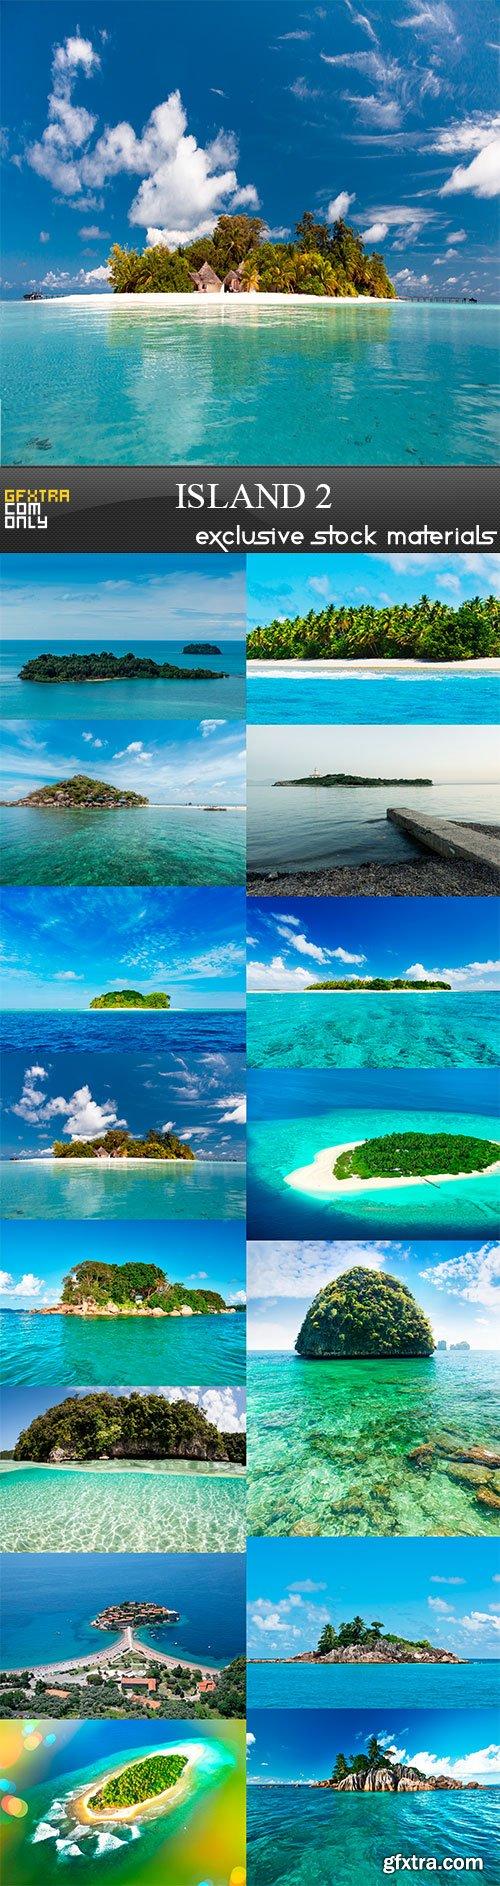 Island 2, 15 x UHQ JPEG